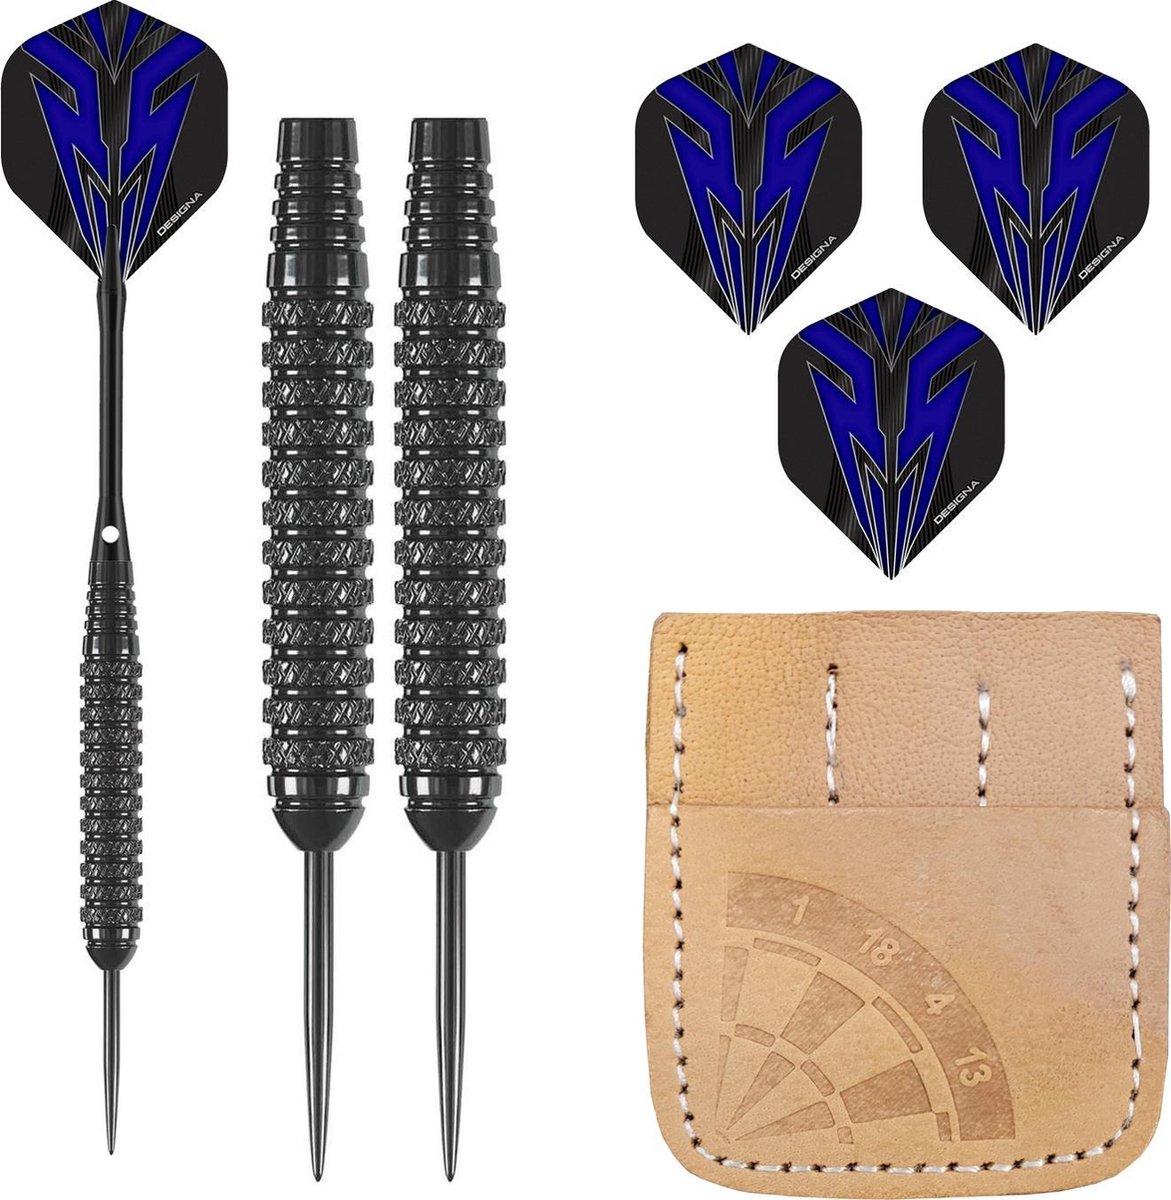 Dragon Darts Serpent Blue - dartpijlen - dart shafts - dart flights - dartpijlen 24 gram - 100% lederen etui